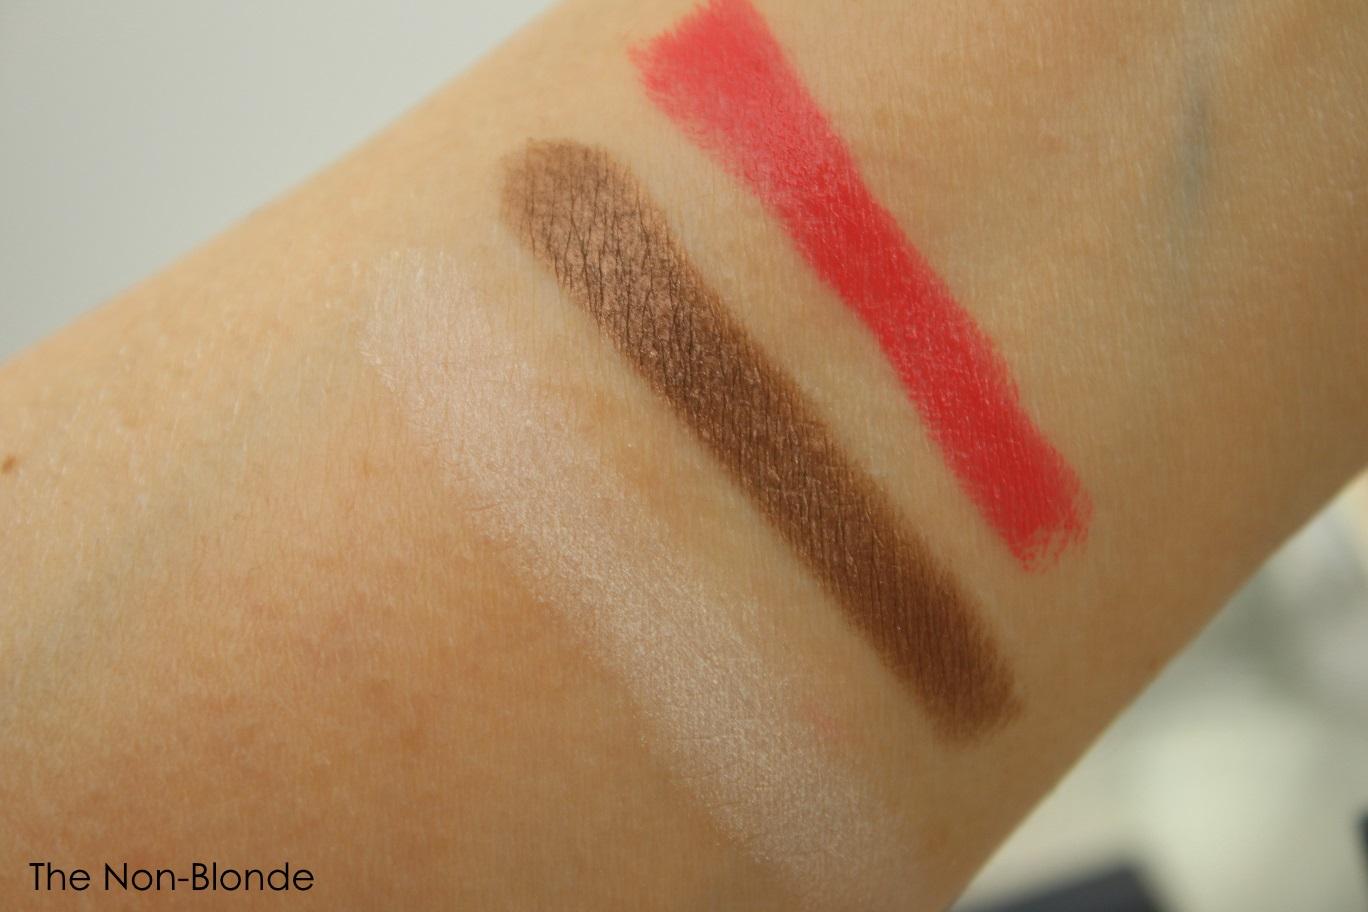 Pure Color Envy Defining Wet/Dry Eyeshadow by Estée Lauder #13